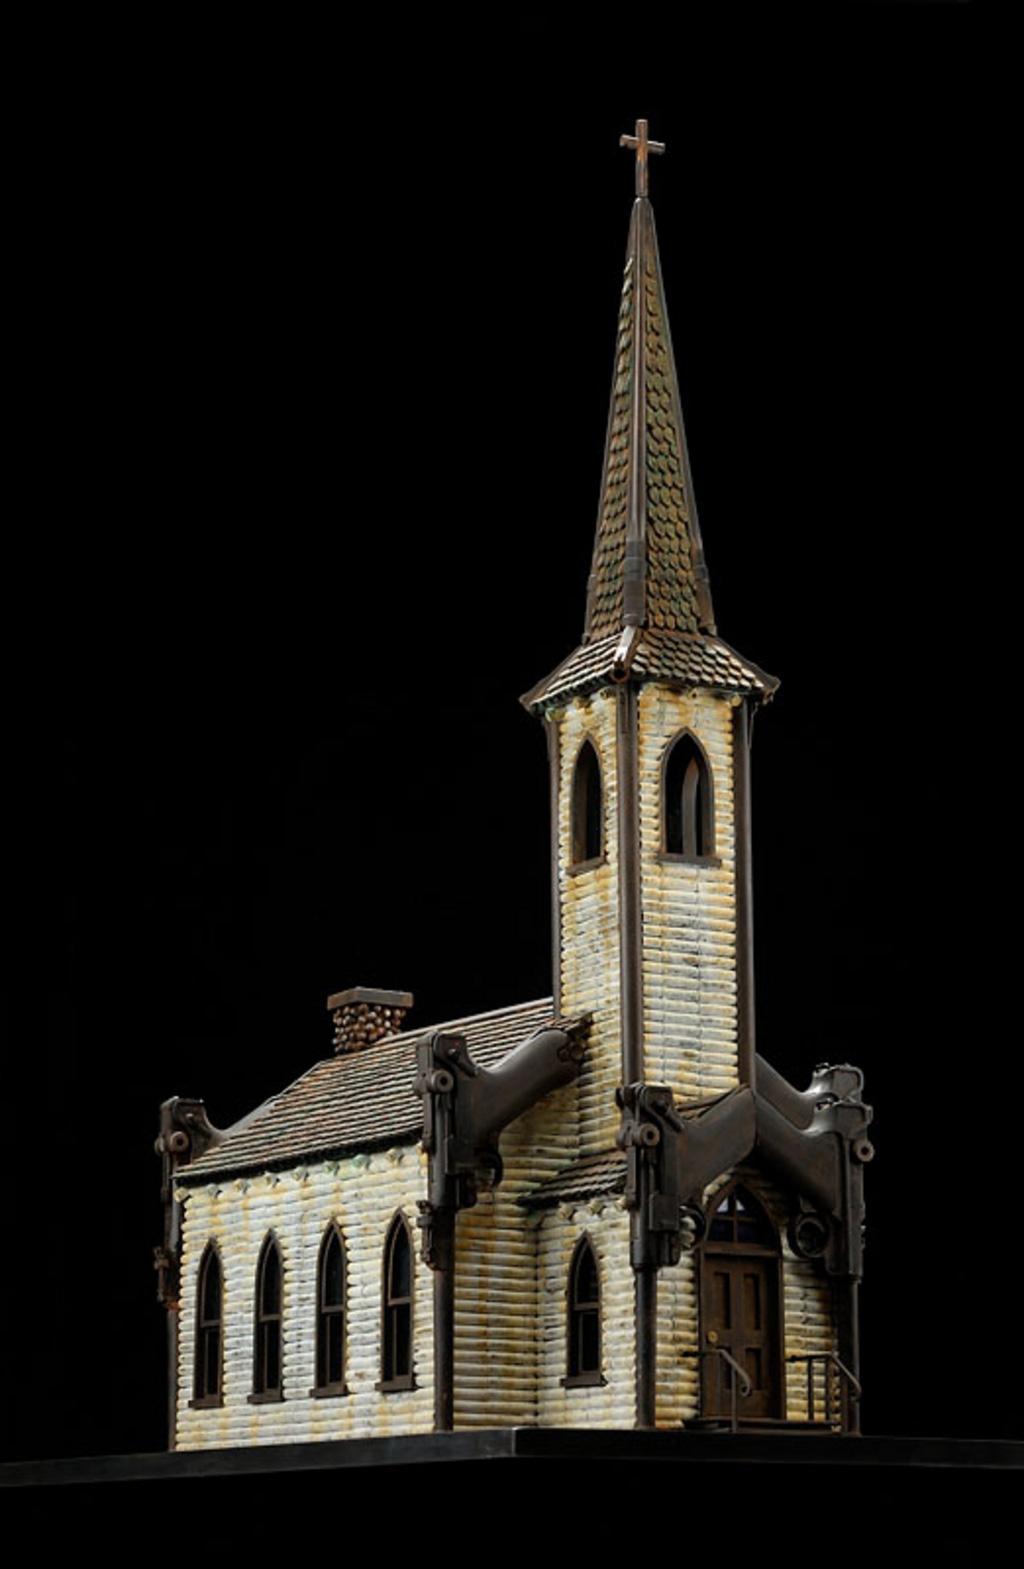 Al Farrow's Religious Sanctuaries Made Of Munitions